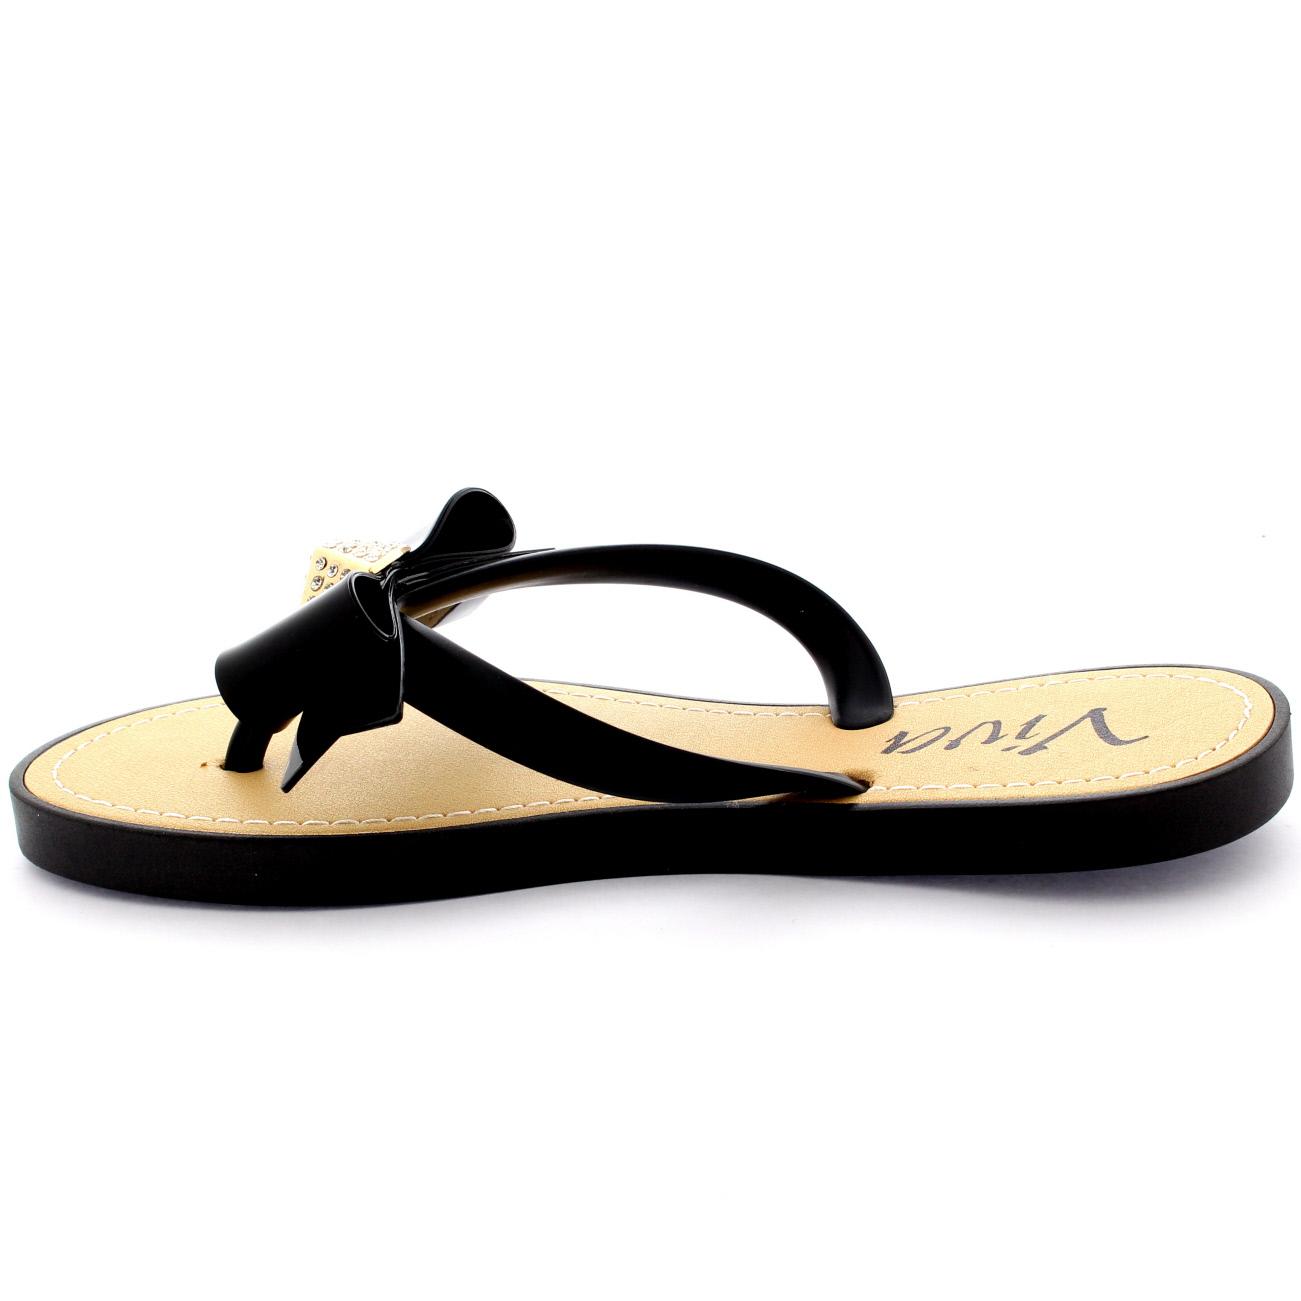 Womens sandals uk - Womens Sandals Summer Holiday Festival Bow Diamante Slip